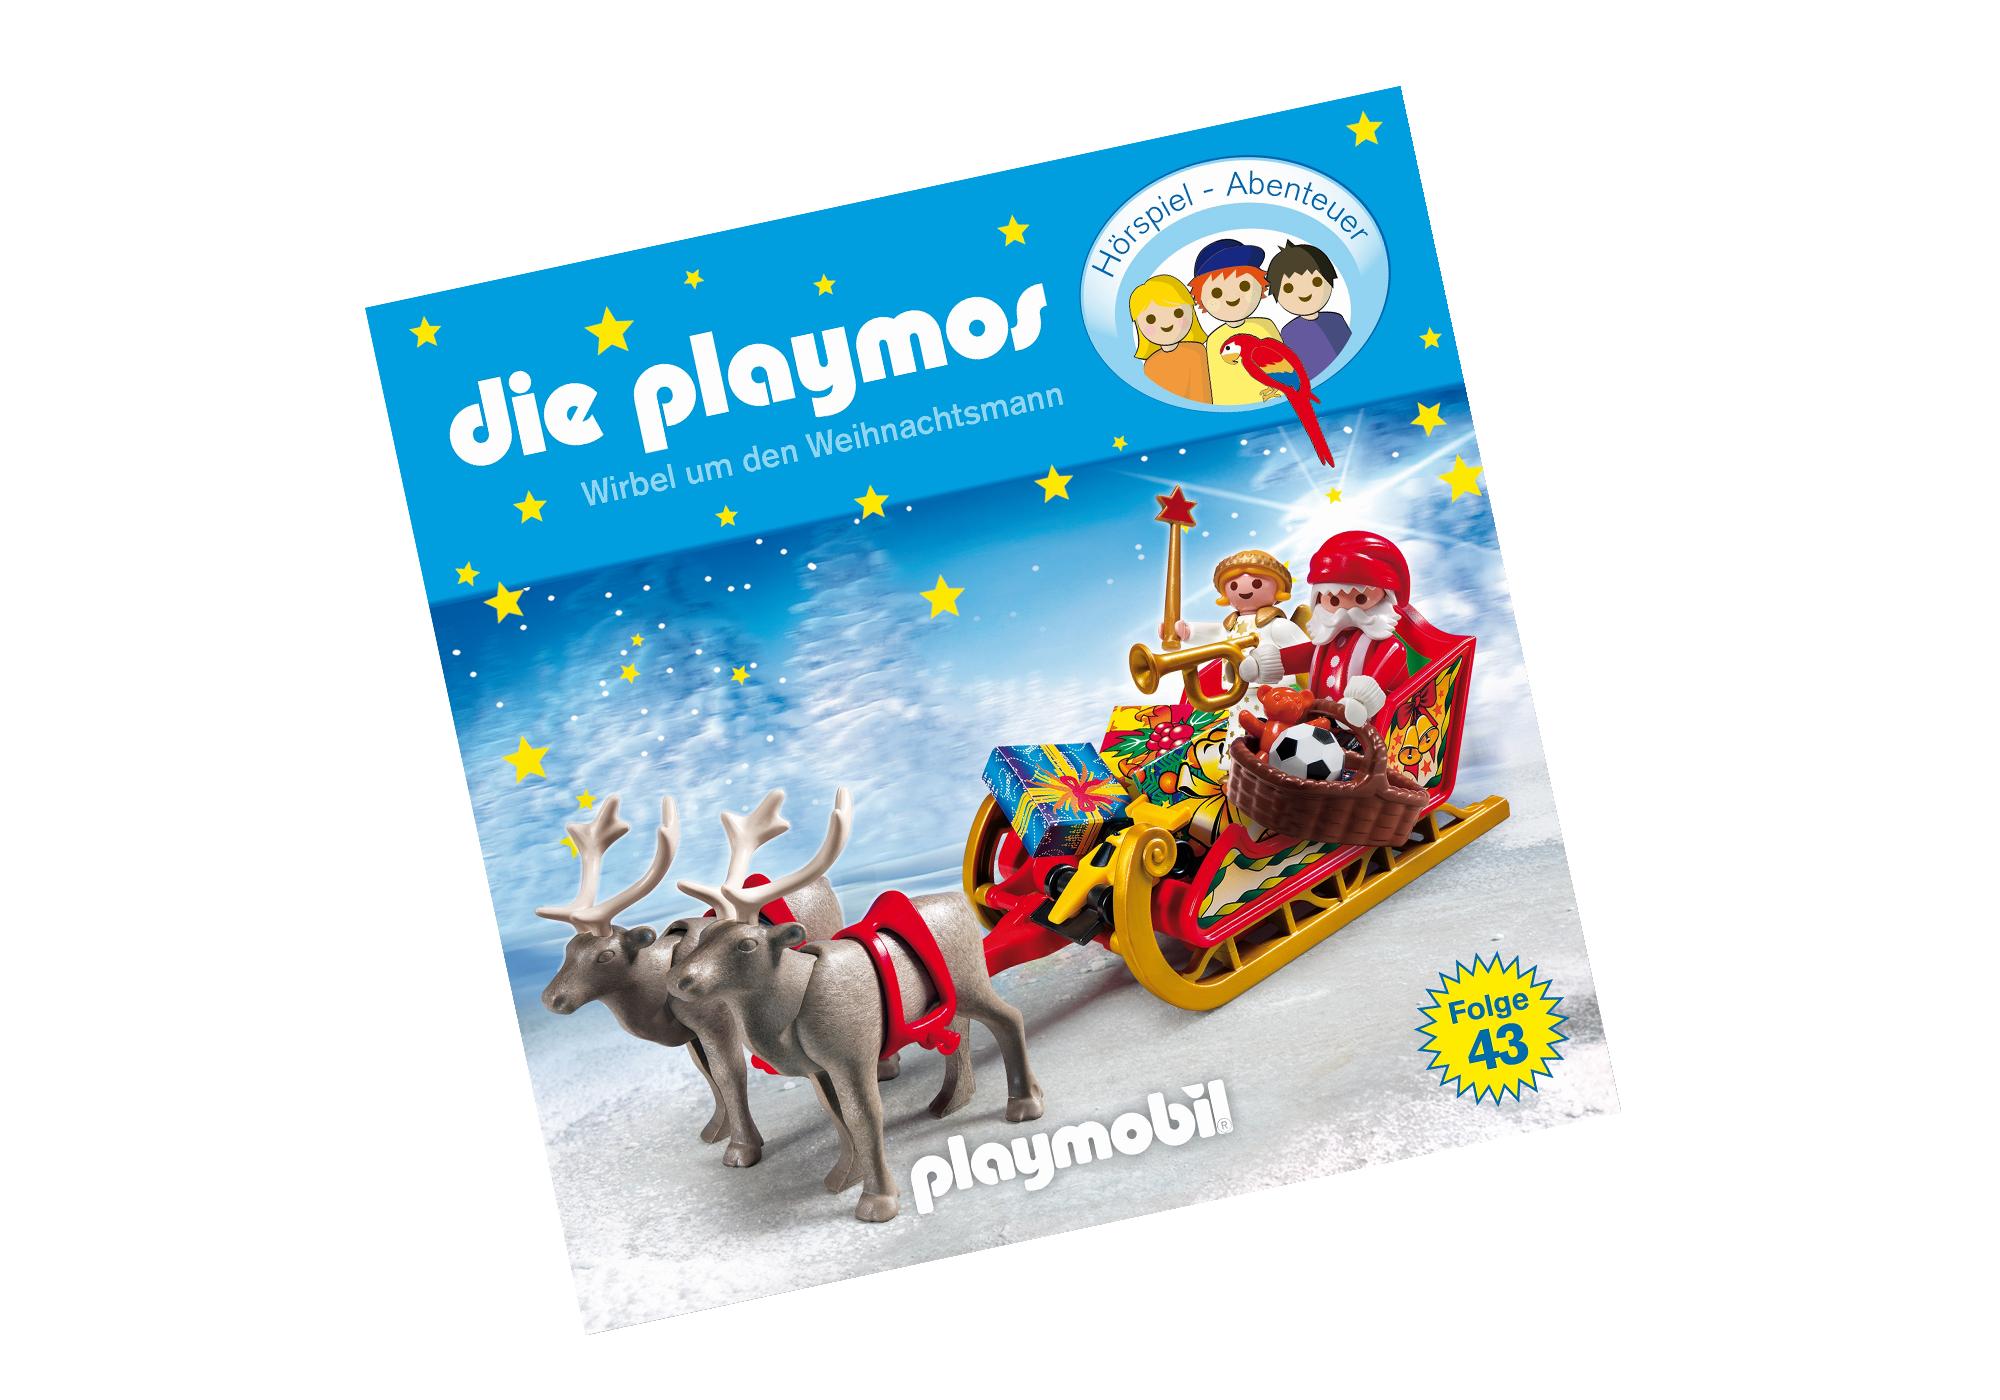 http://media.playmobil.com/i/playmobil/80456_product_detail